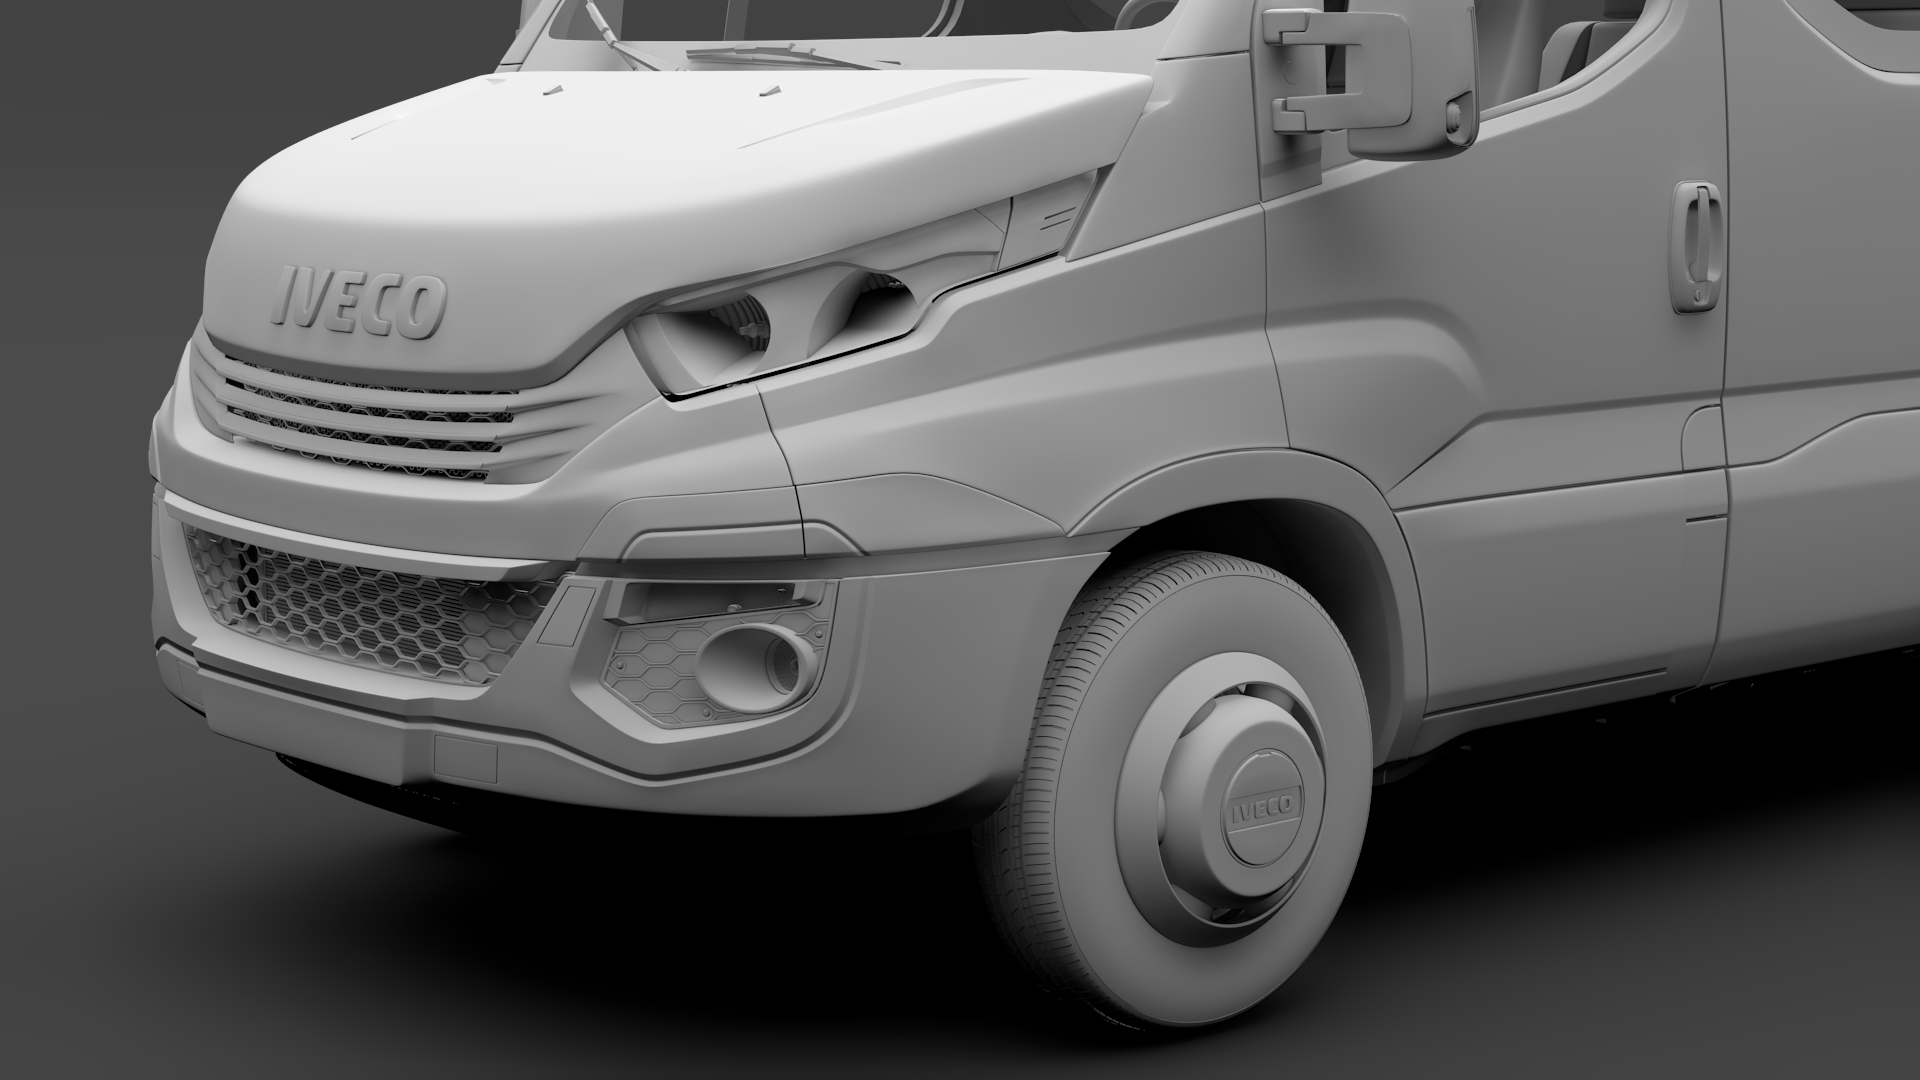 iveco daily minibus l3h3 2017 3d model max fbx c4d lwo ma mb hrc xsi obj 276152